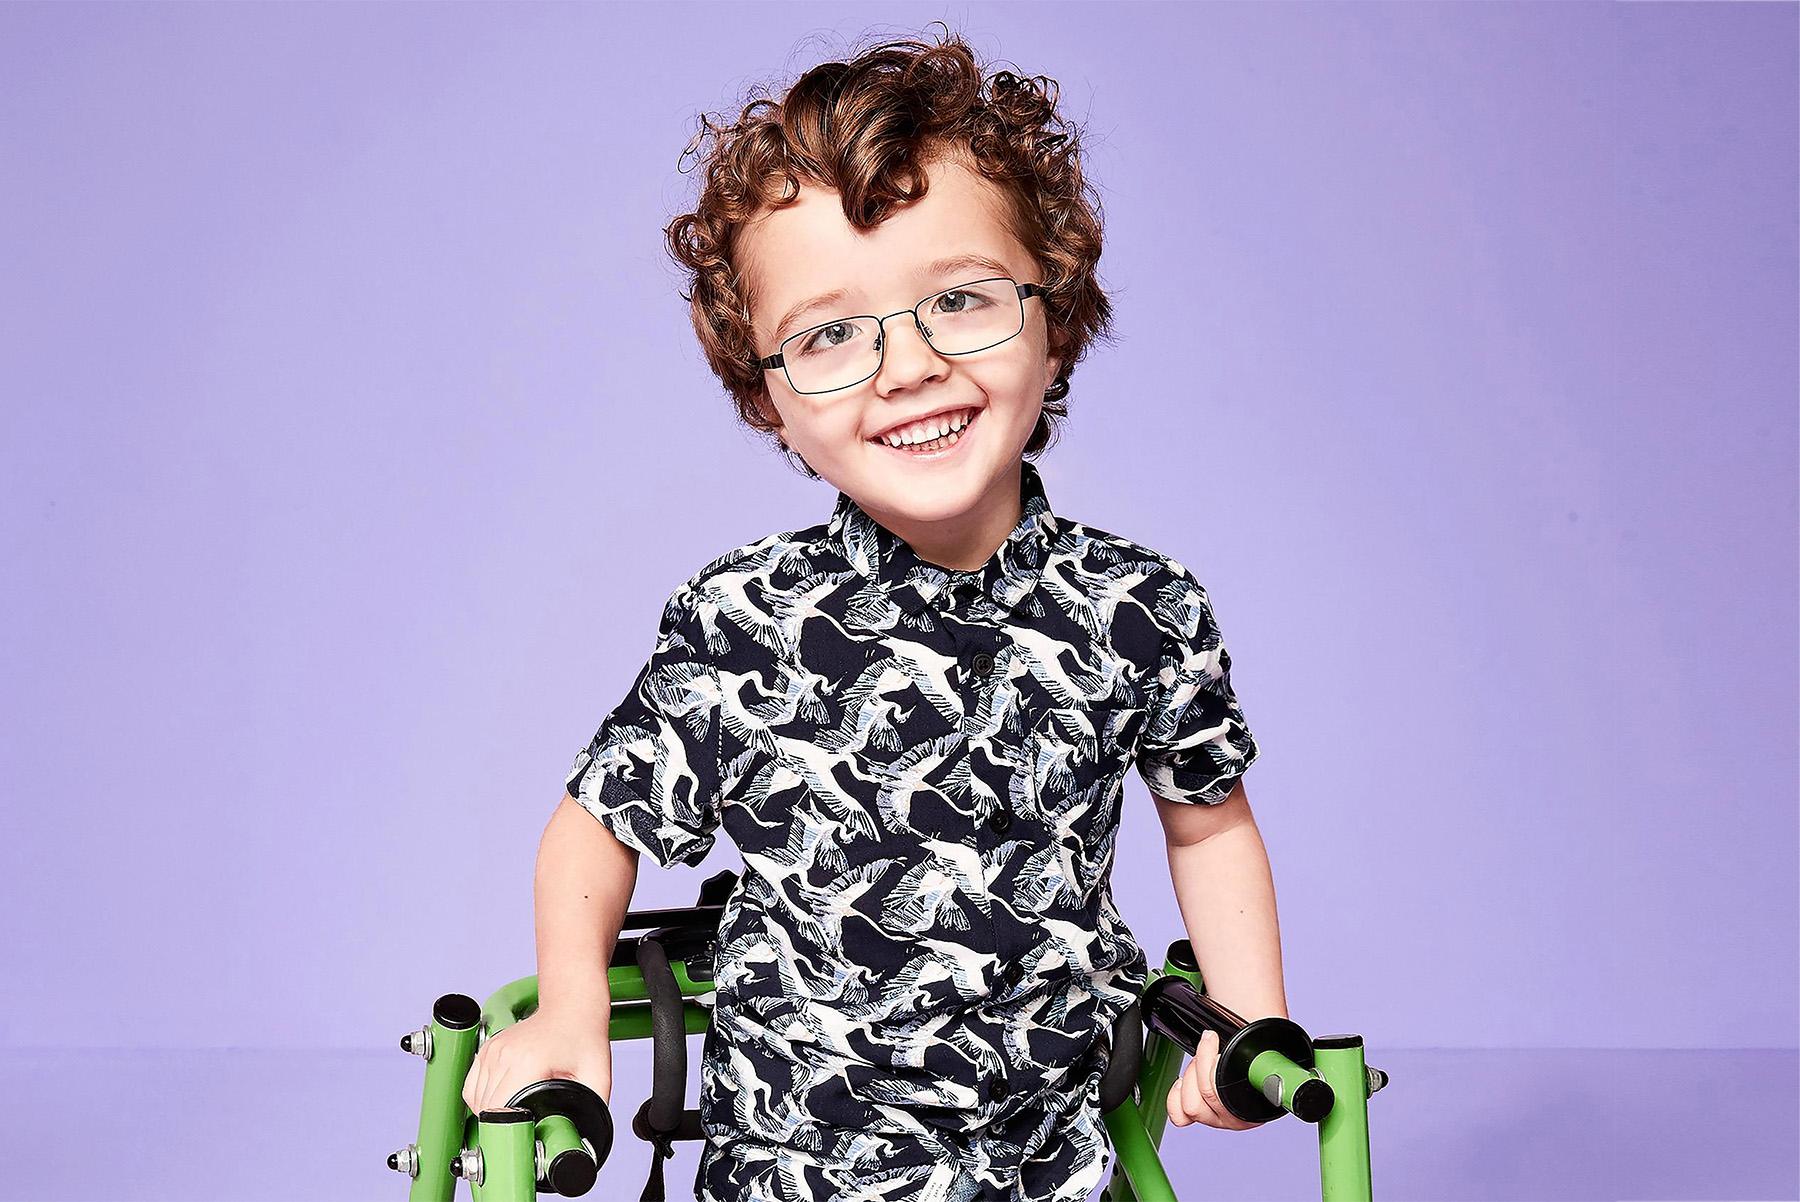 teddy berriman, model, actor and medical CBD user